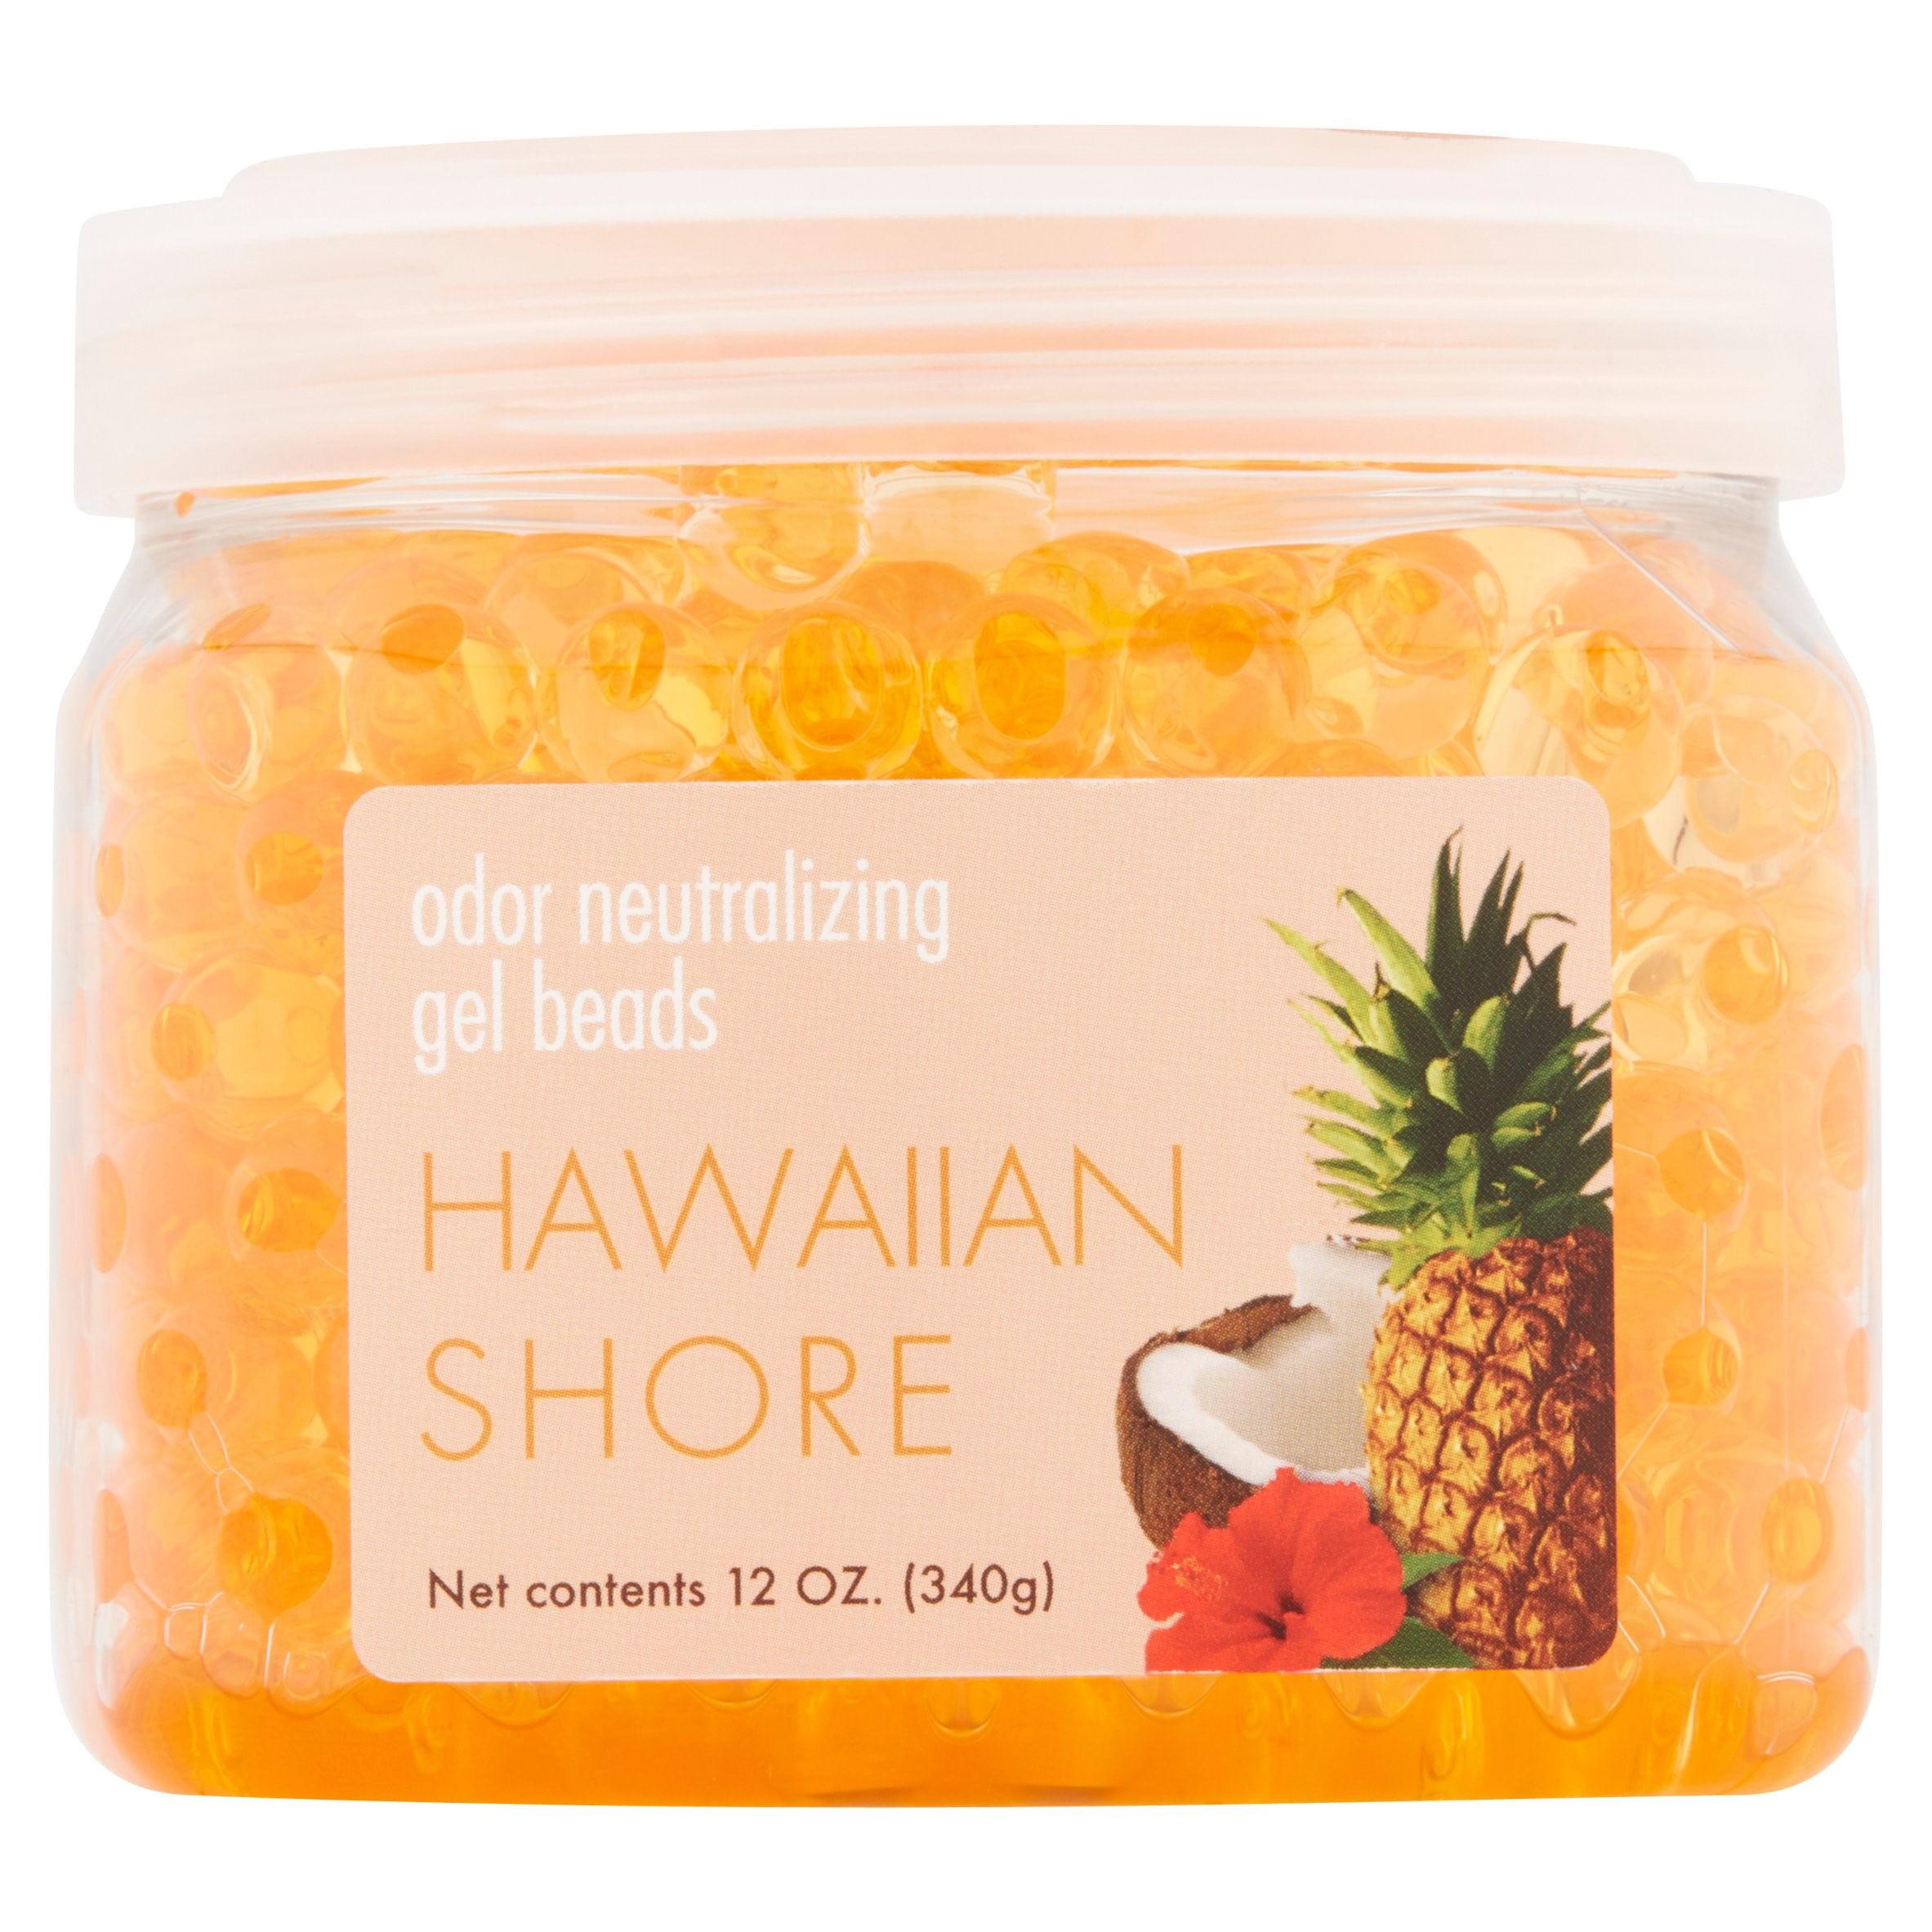 Hawaiian Shore Odor Neutralizing Gel Beads, 12 oz